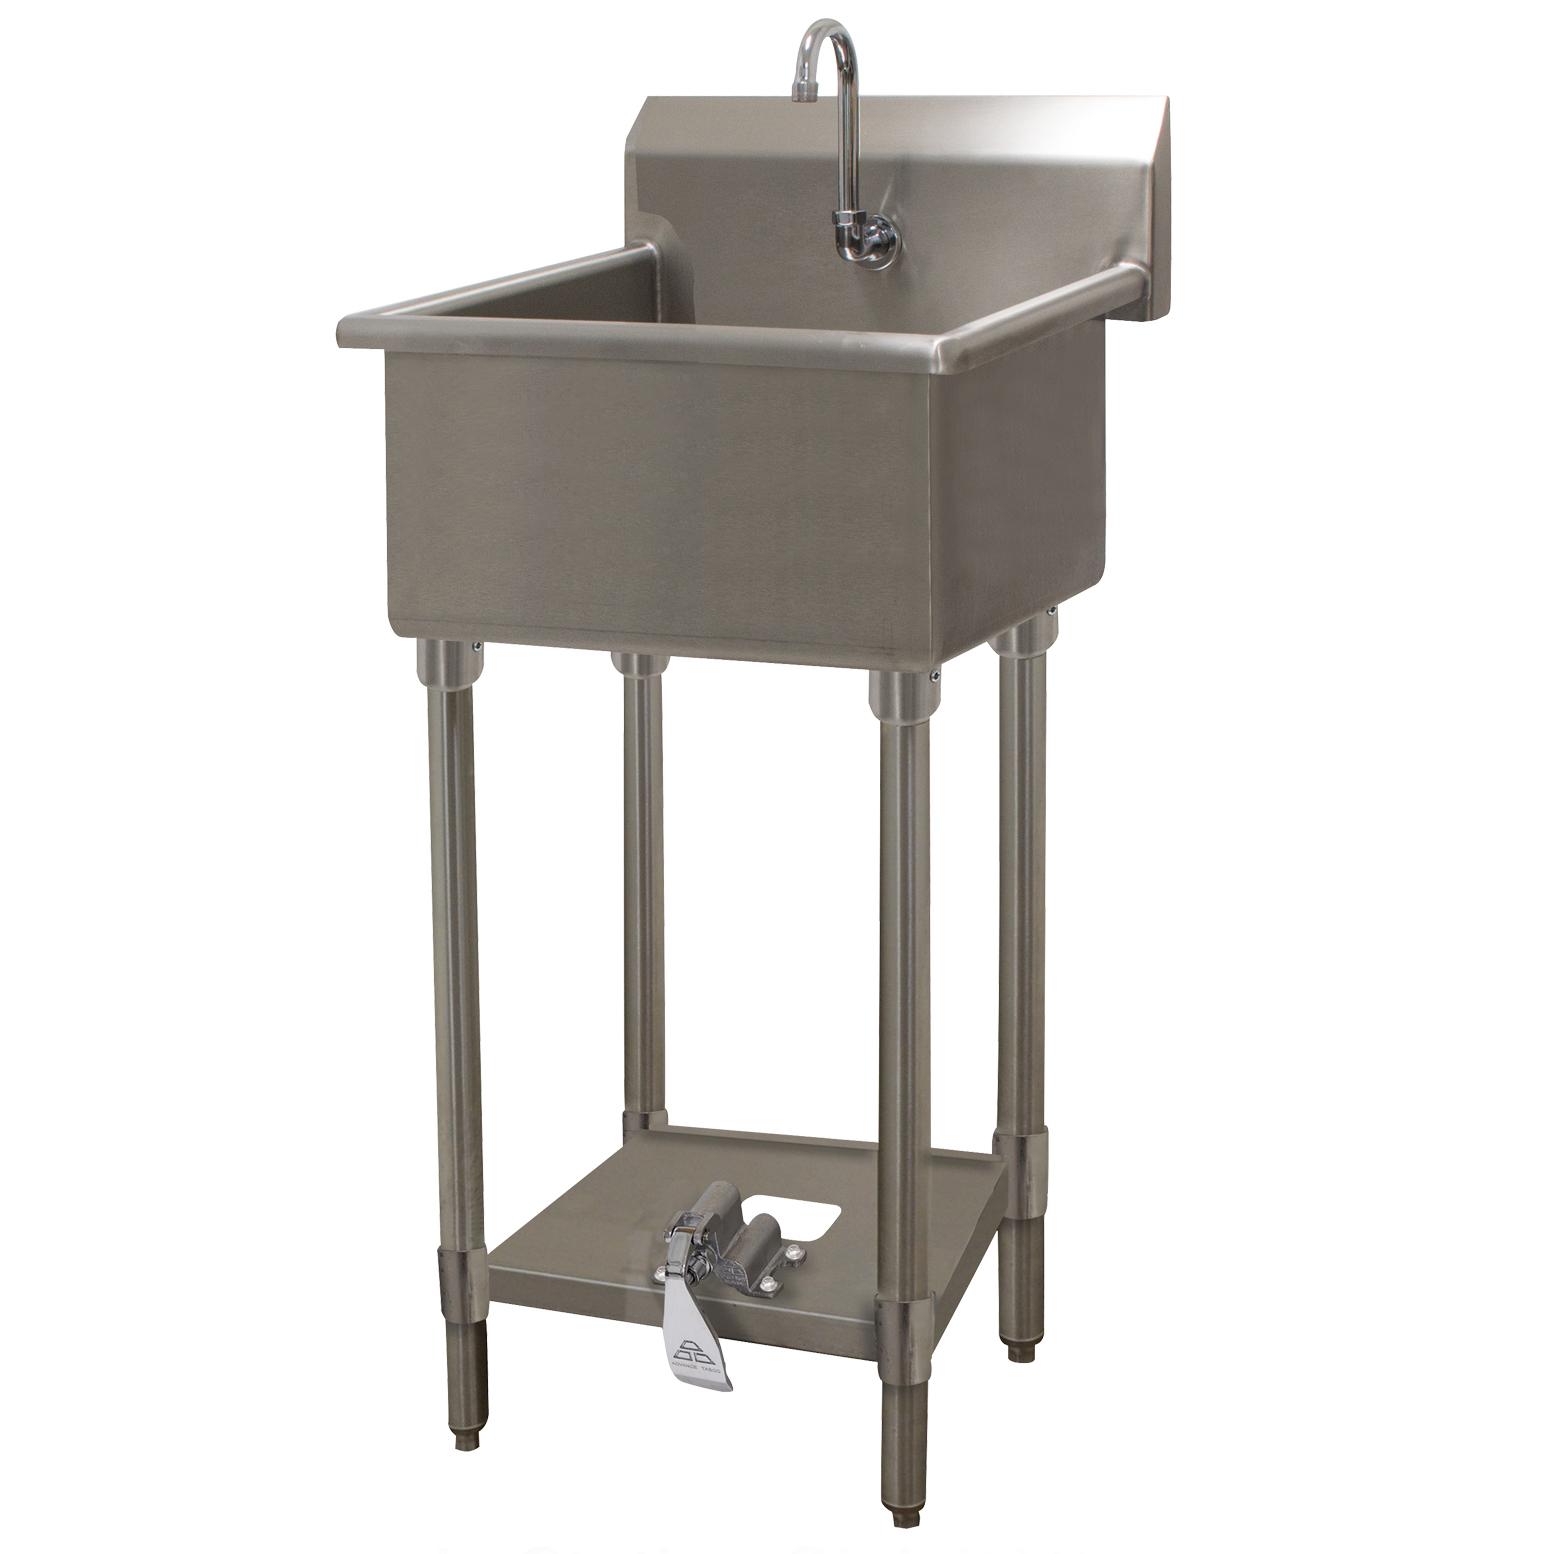 Advance Tabco FC-FM-2721FV sink, hand